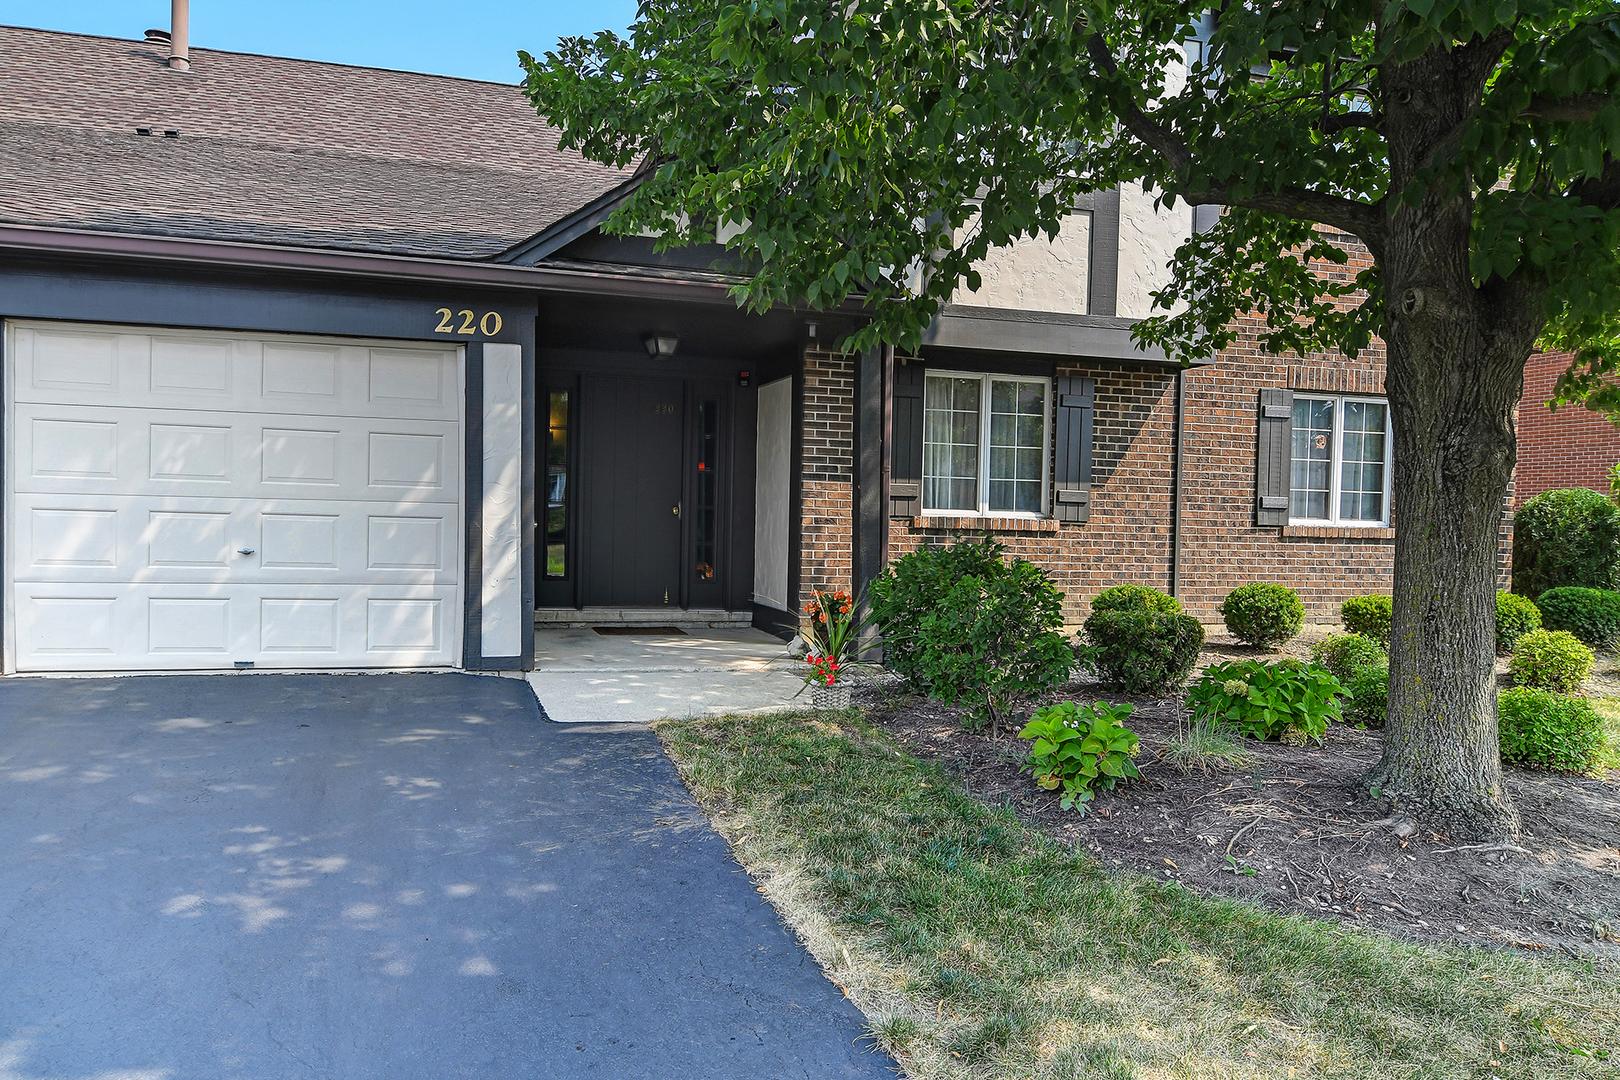 220 Windsor C, WILLOWBROOK, Illinois, 60527